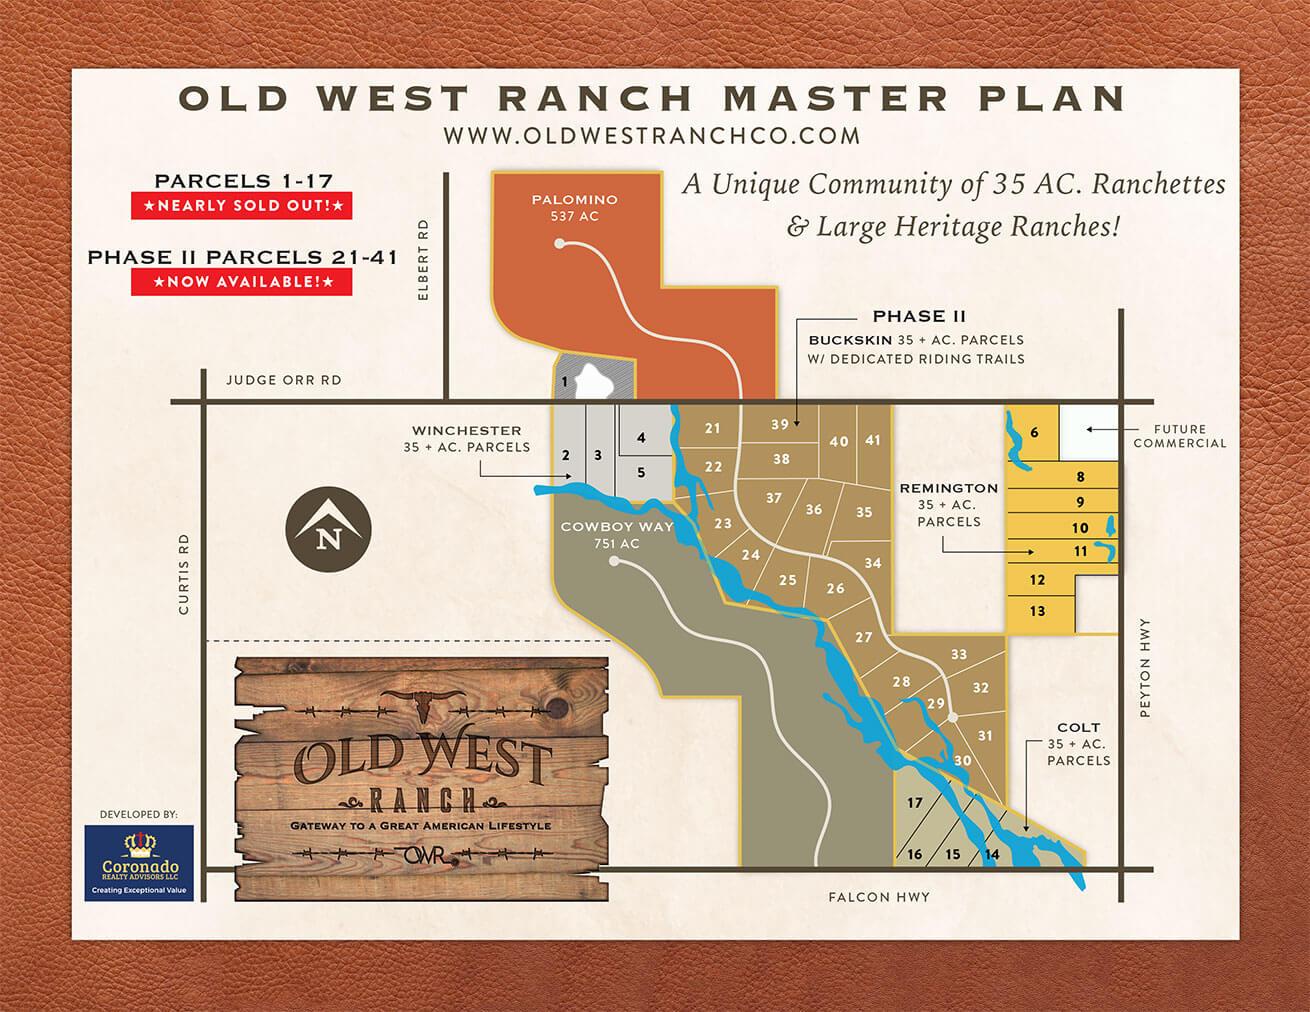 Old-West-Ranch-CO-Master-Plan-Buckskin-Phase-II